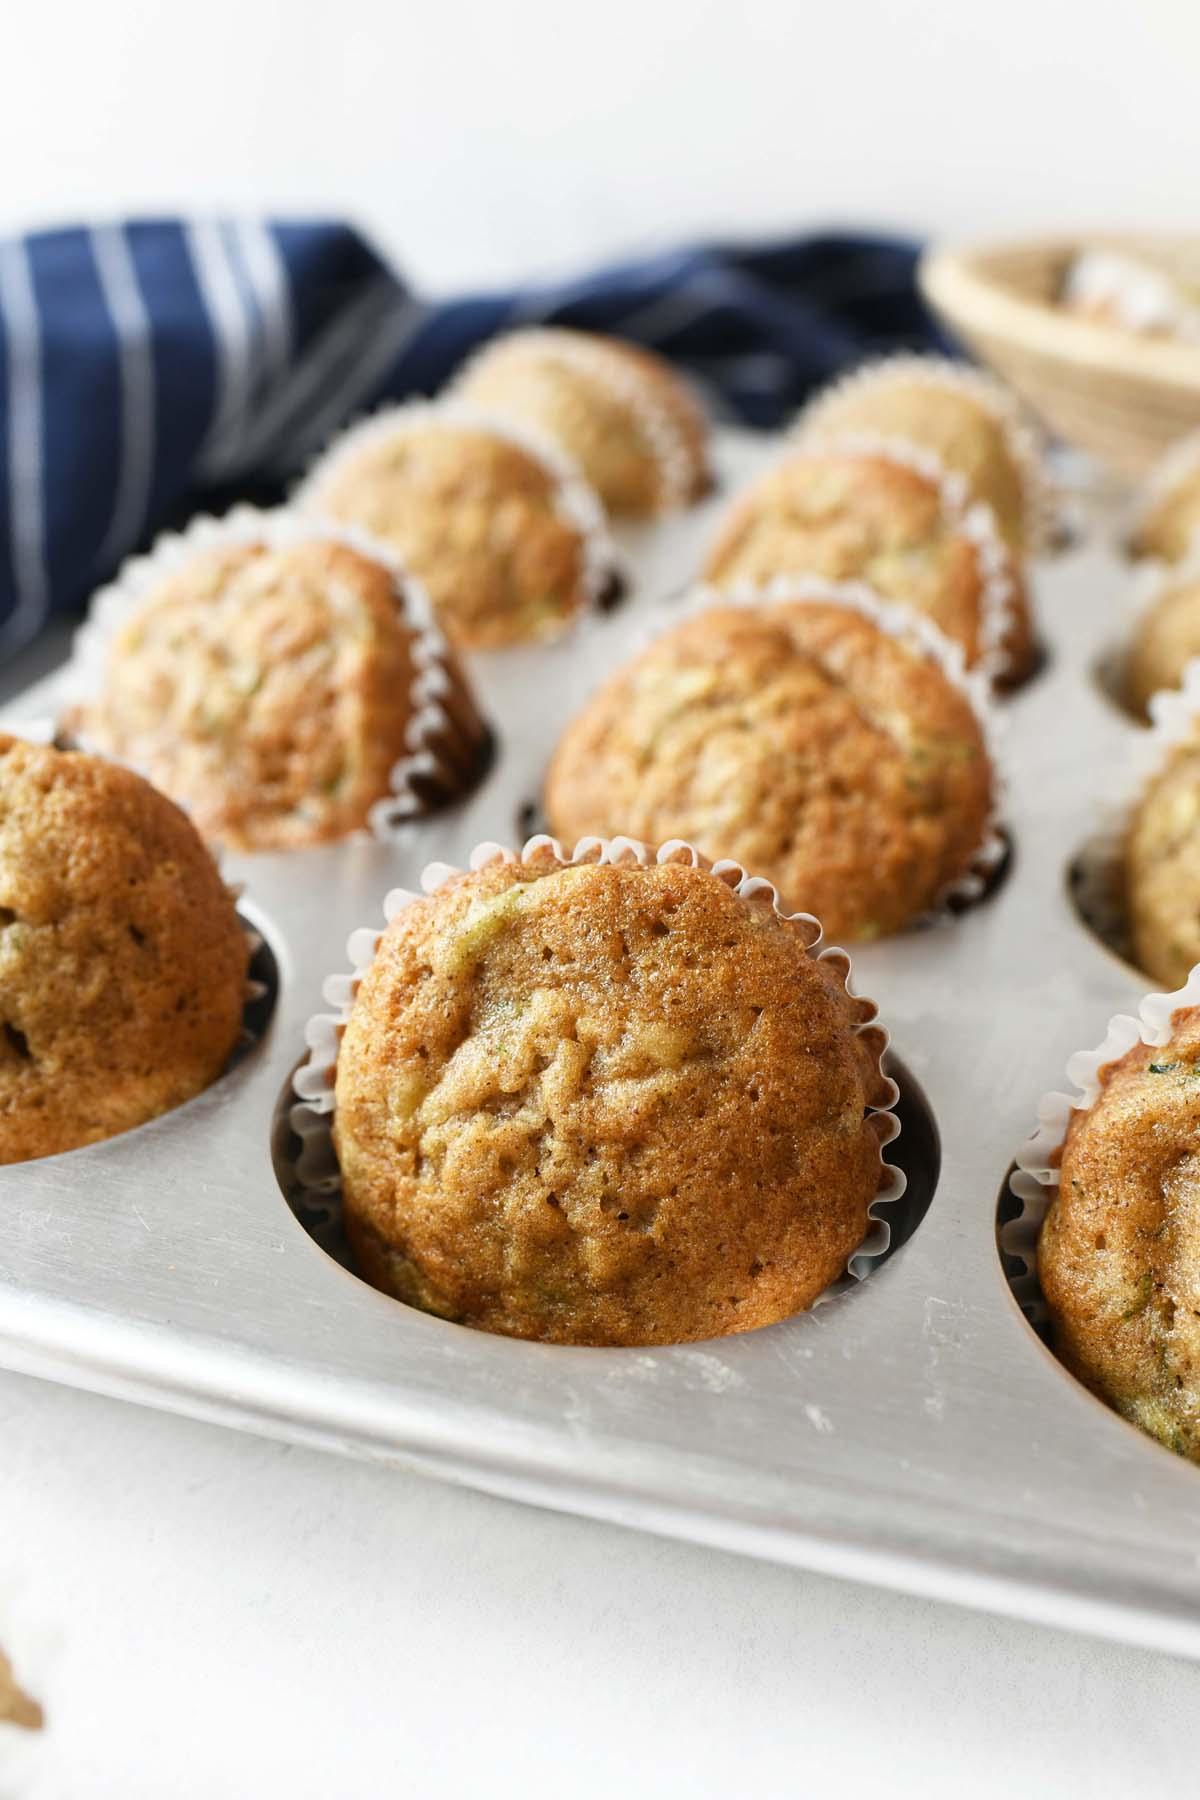 Banana Zucchini muffins in a silver muffin pan.